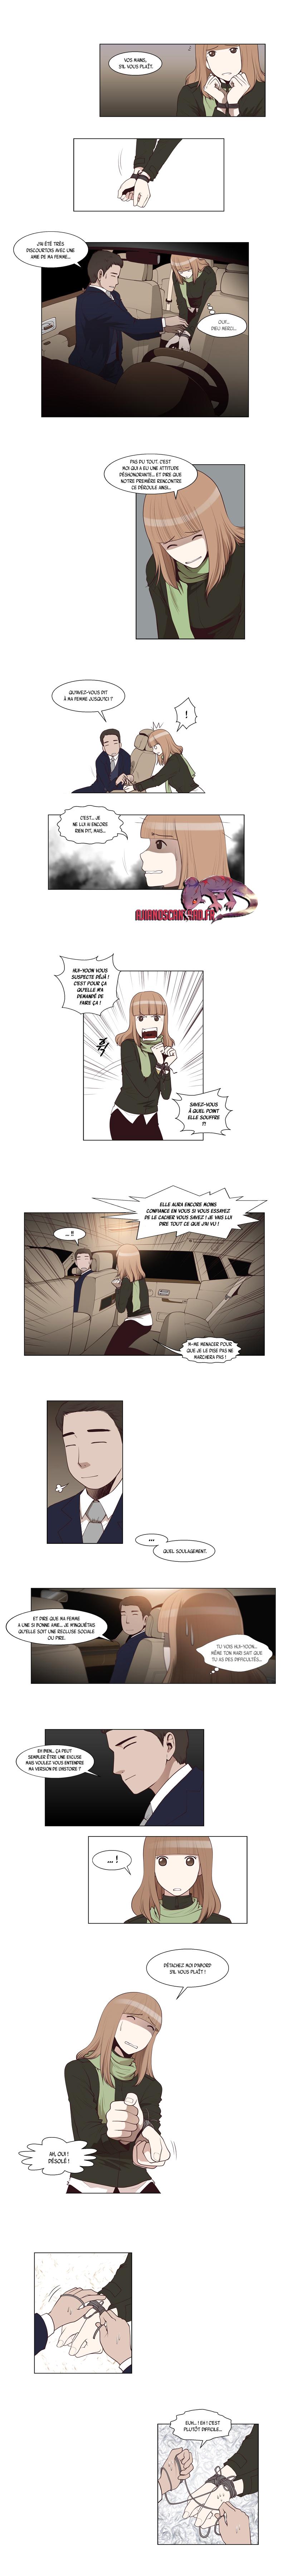 https://nine.mangadogs.com/fr_manga/pic1/63/639/33397/MrsAngel22VF_1_323.jpg Page 2